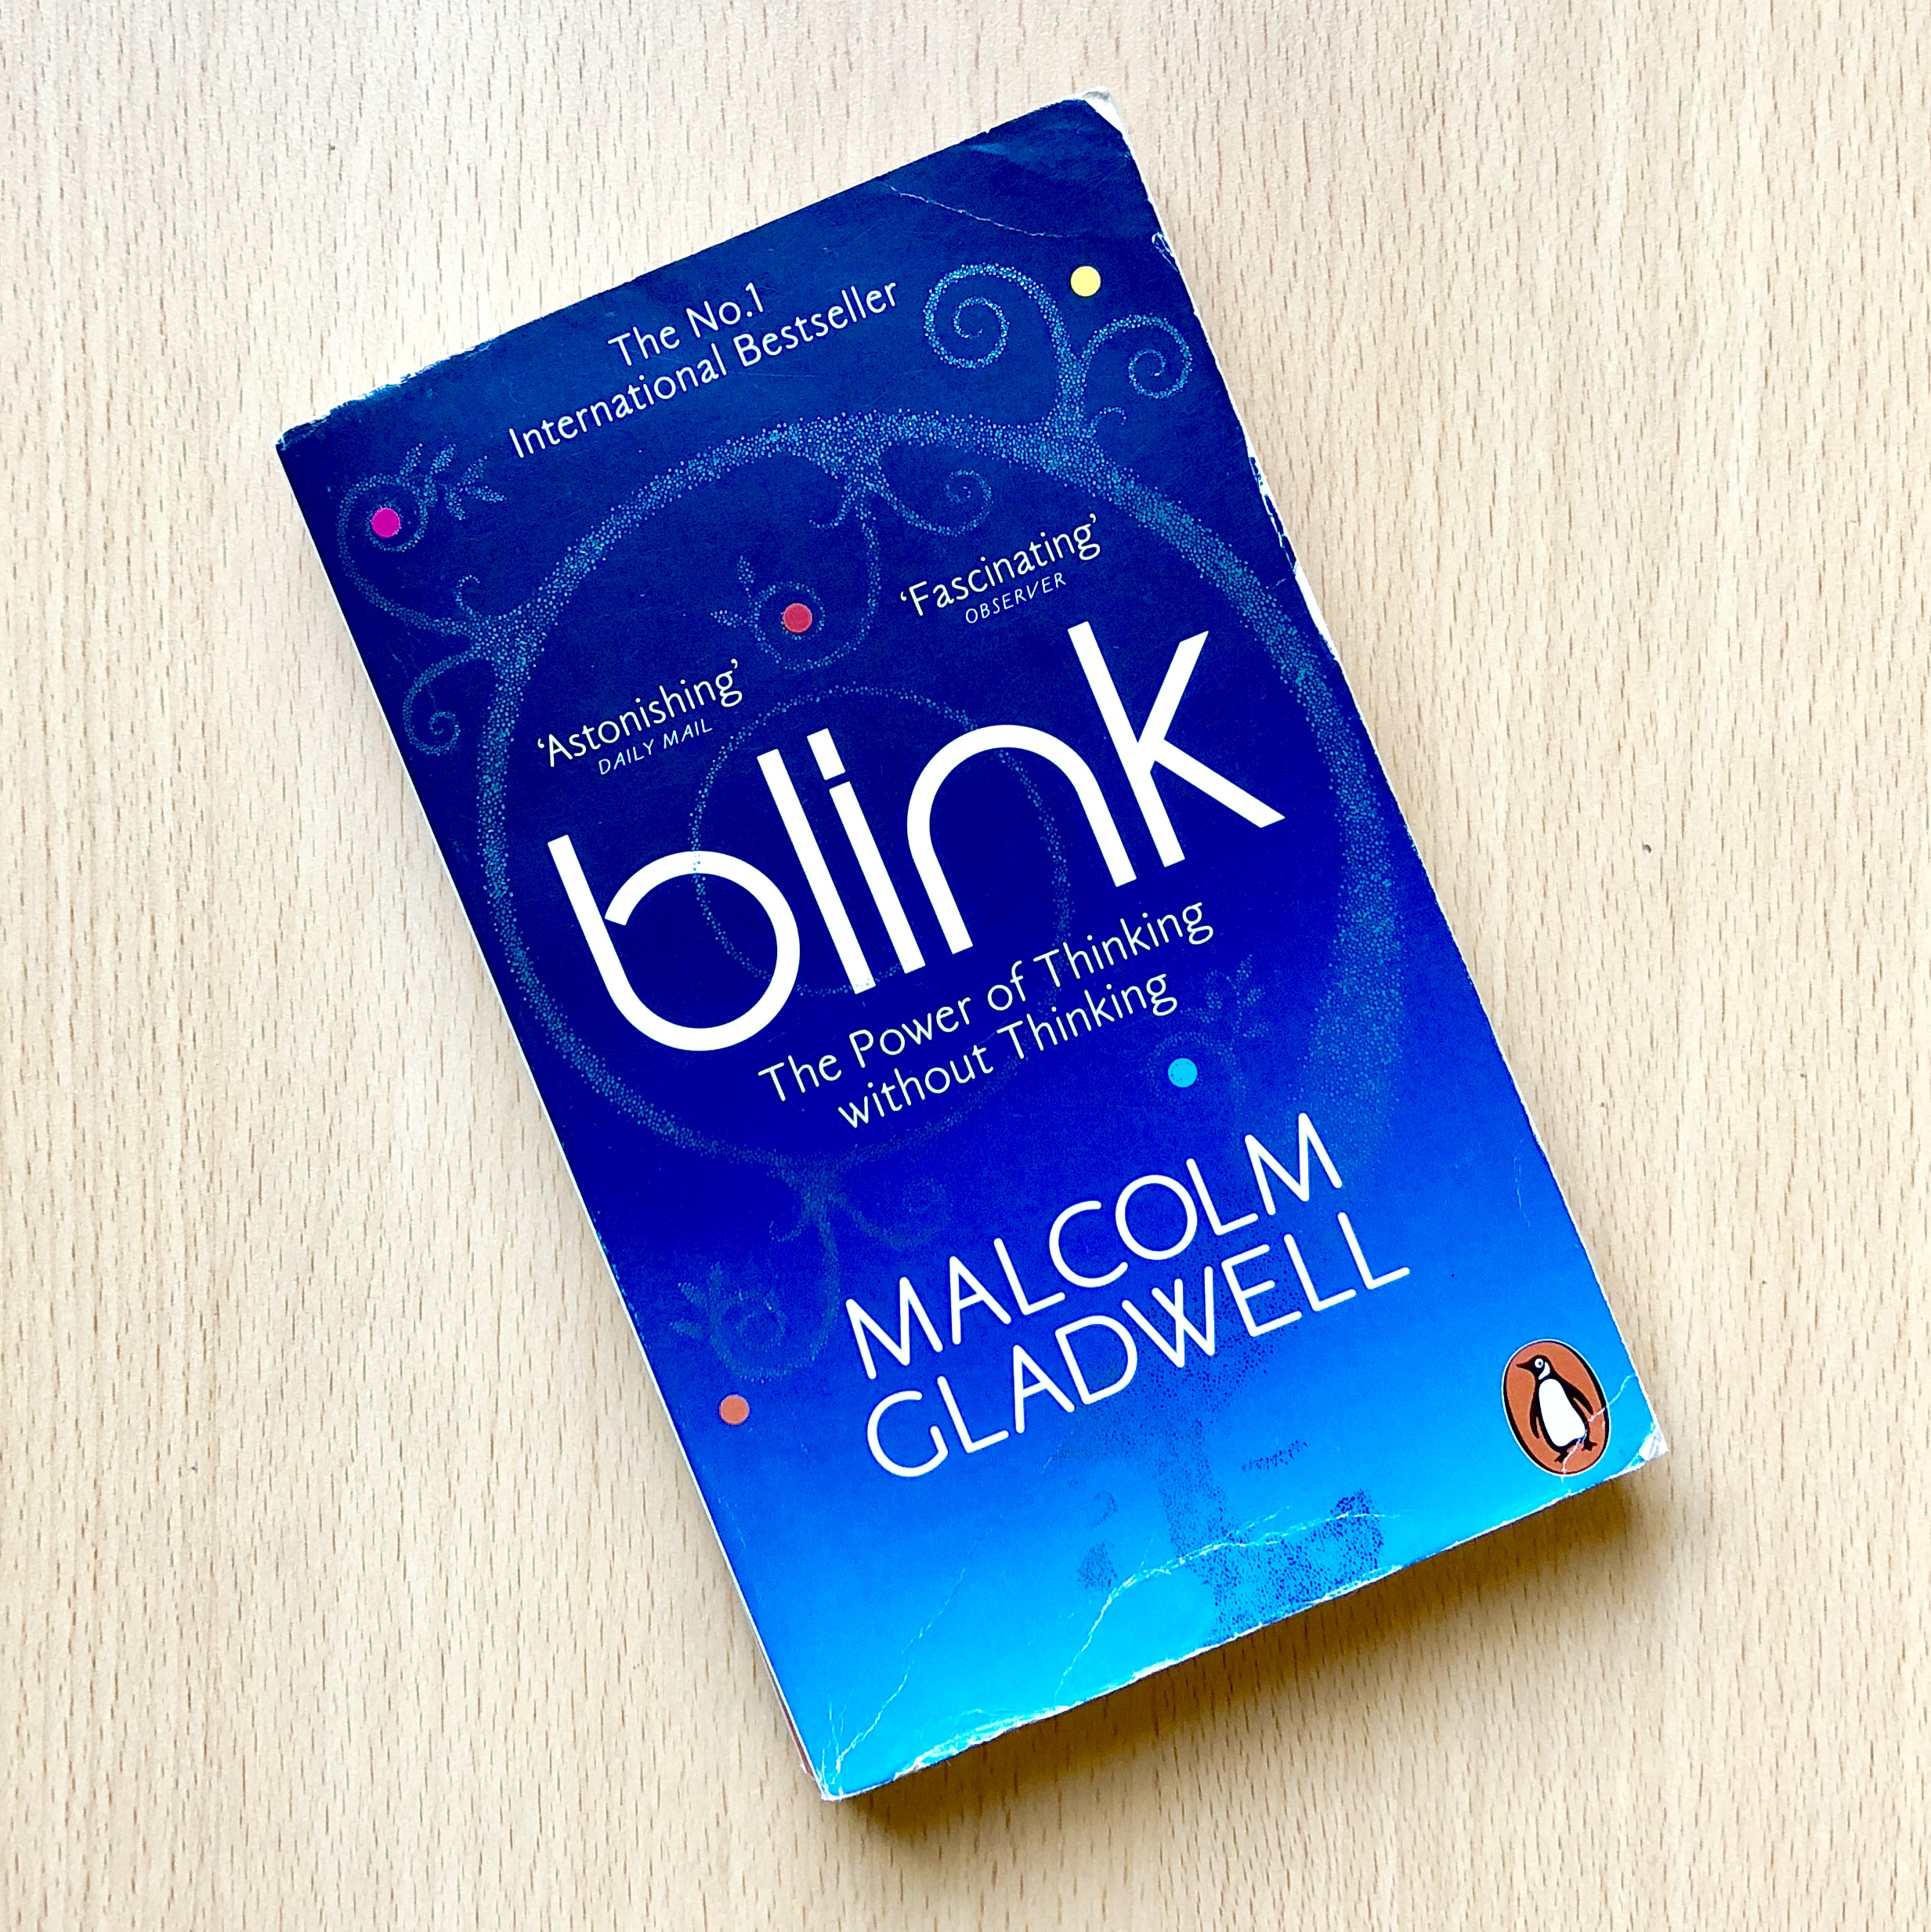 Blink | Malcolm Gladwell